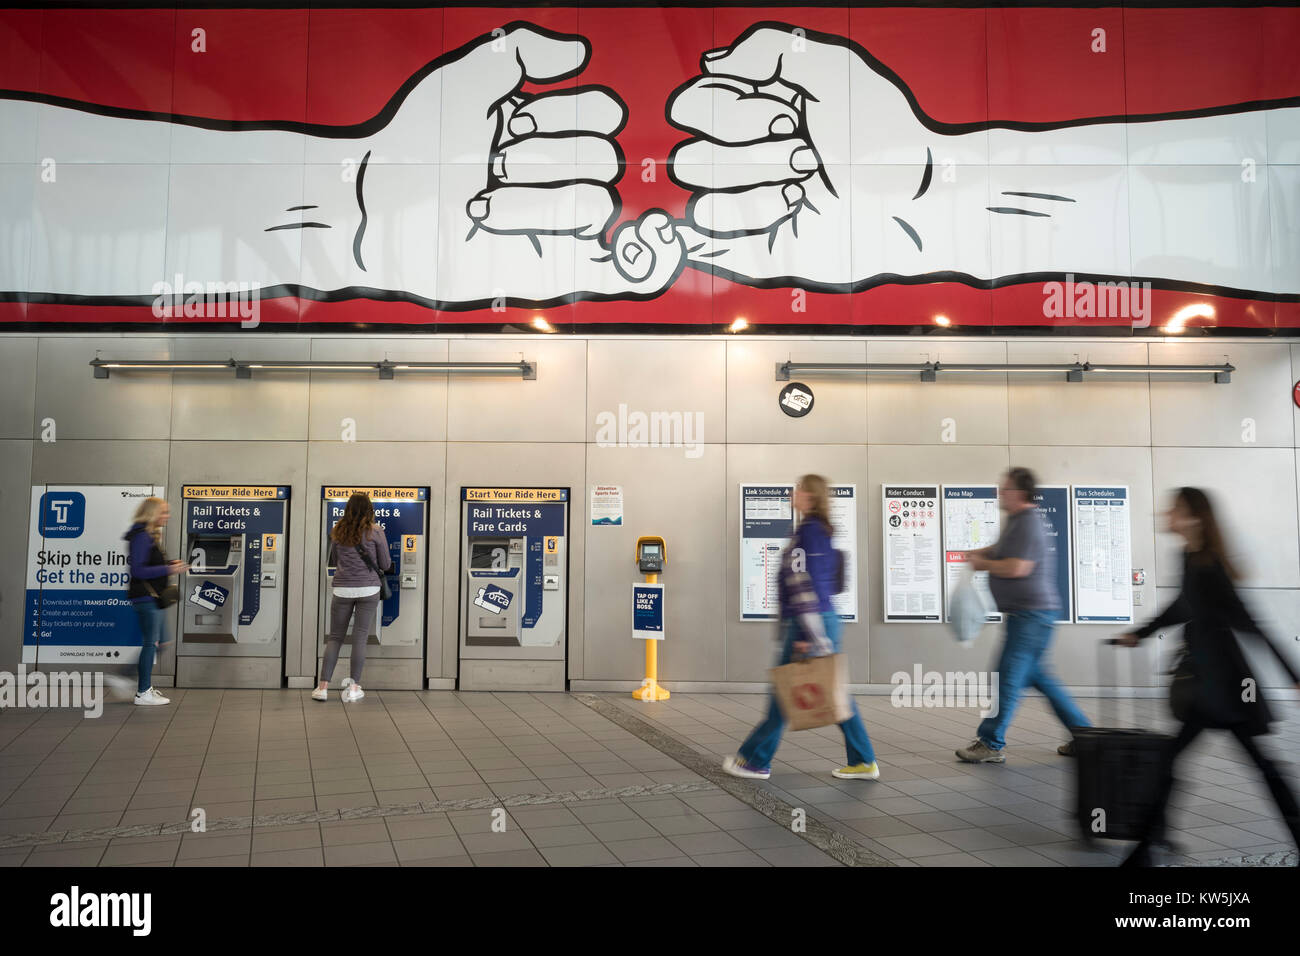 Rail Ticket Vending Machine Stock Photos & Rail Ticket